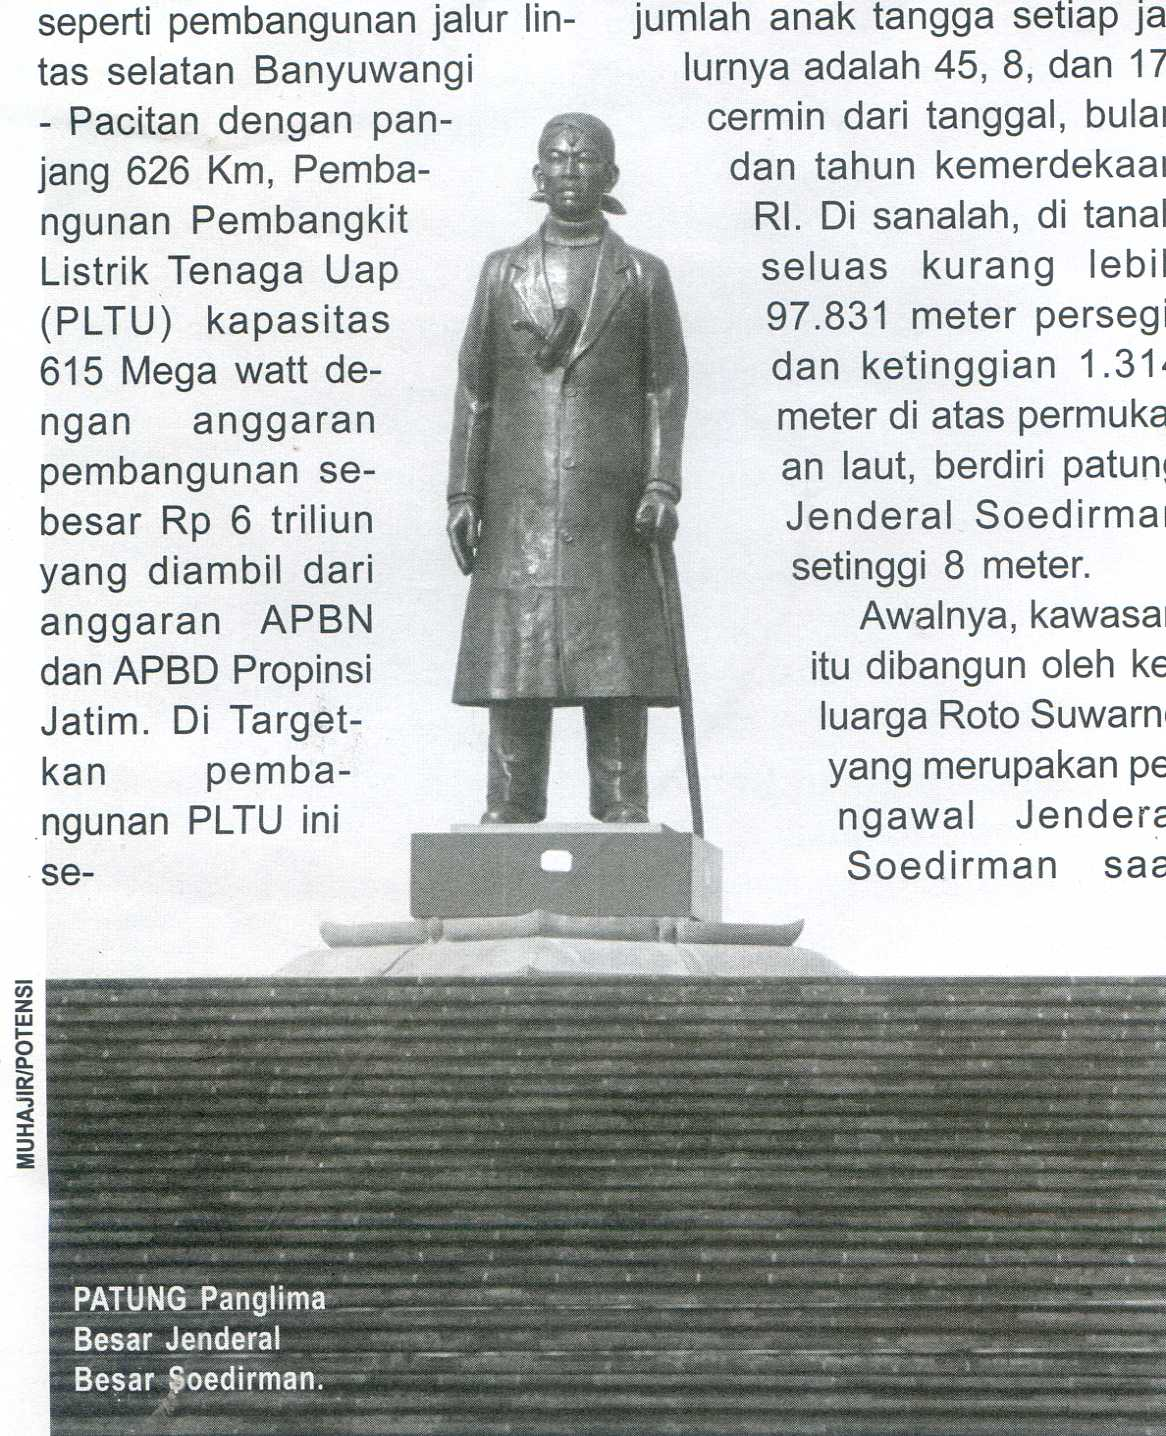 Monumen Jenderal Soedirman Pacitan Pusaka Jawatimuran Geriliya Sudirman Kab Nganjuk